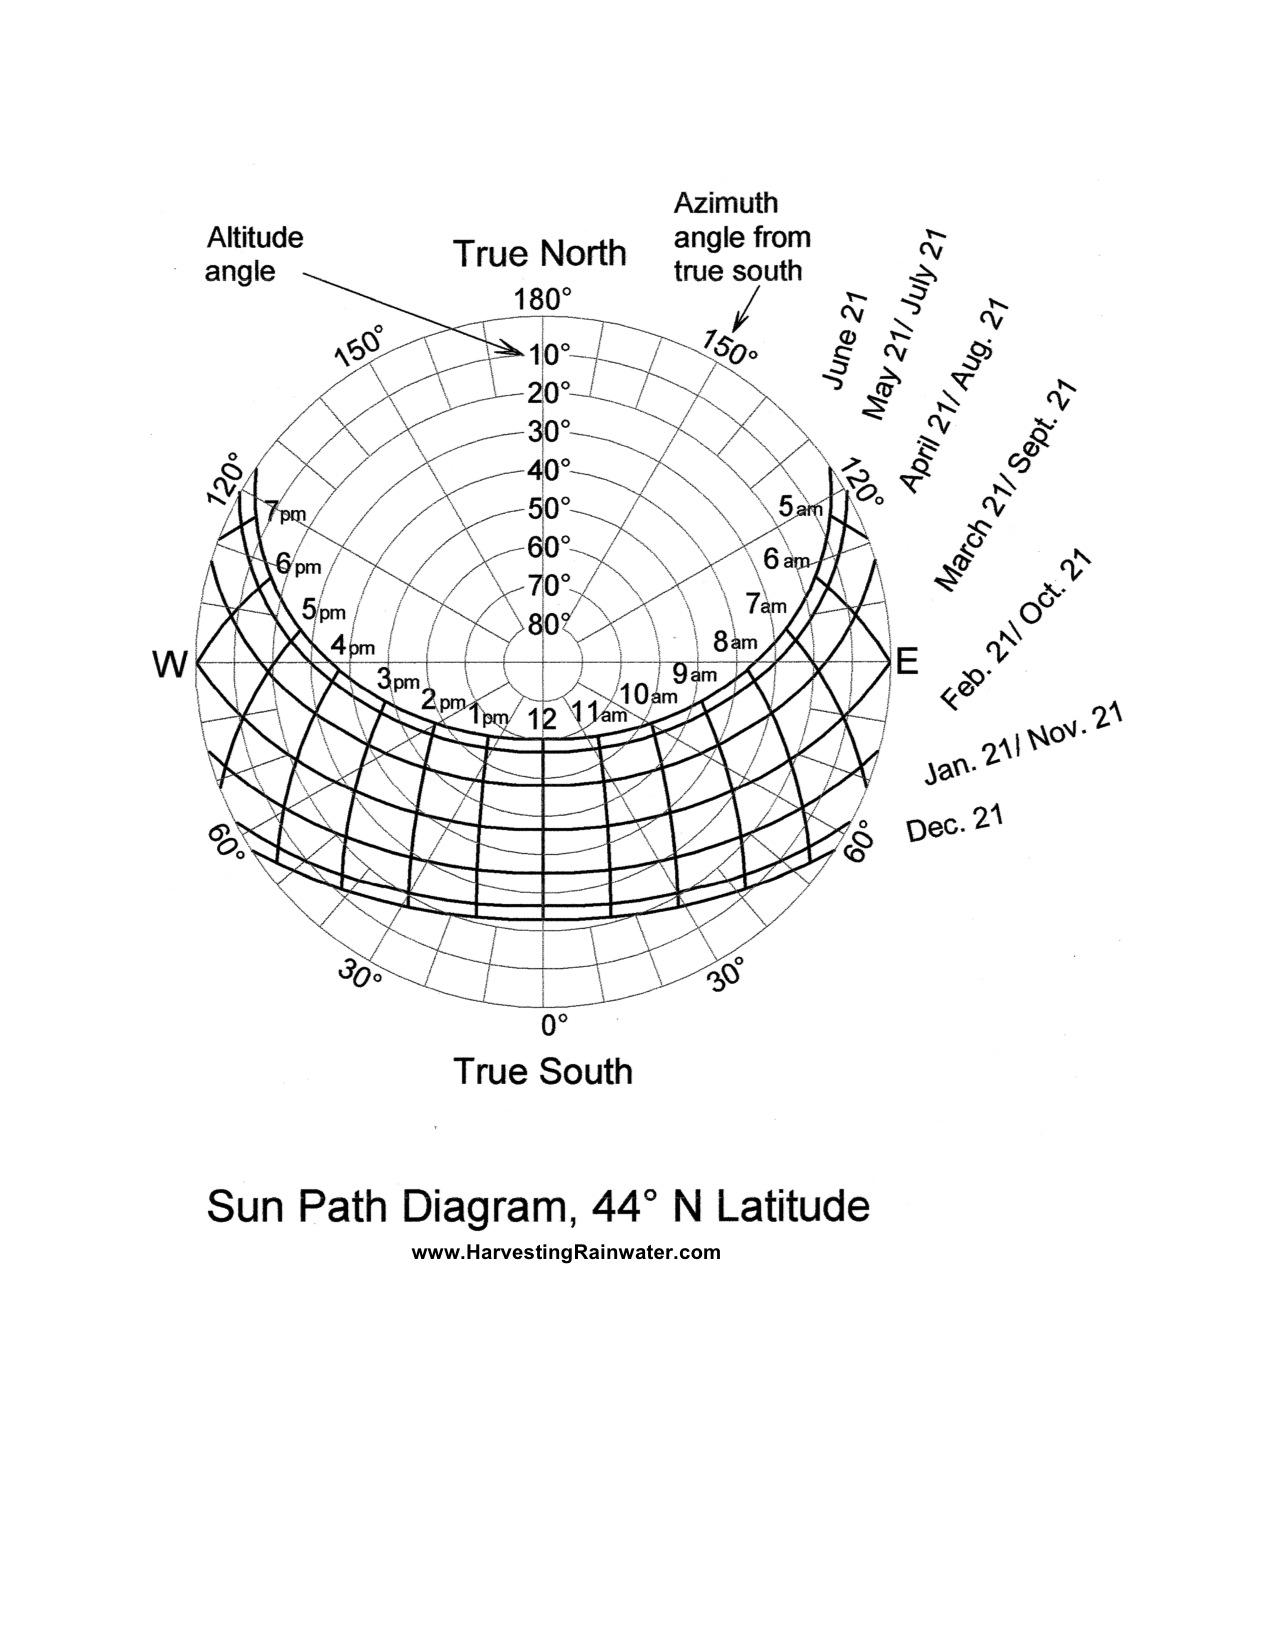 Sun Path Diagram 44o N Latitude